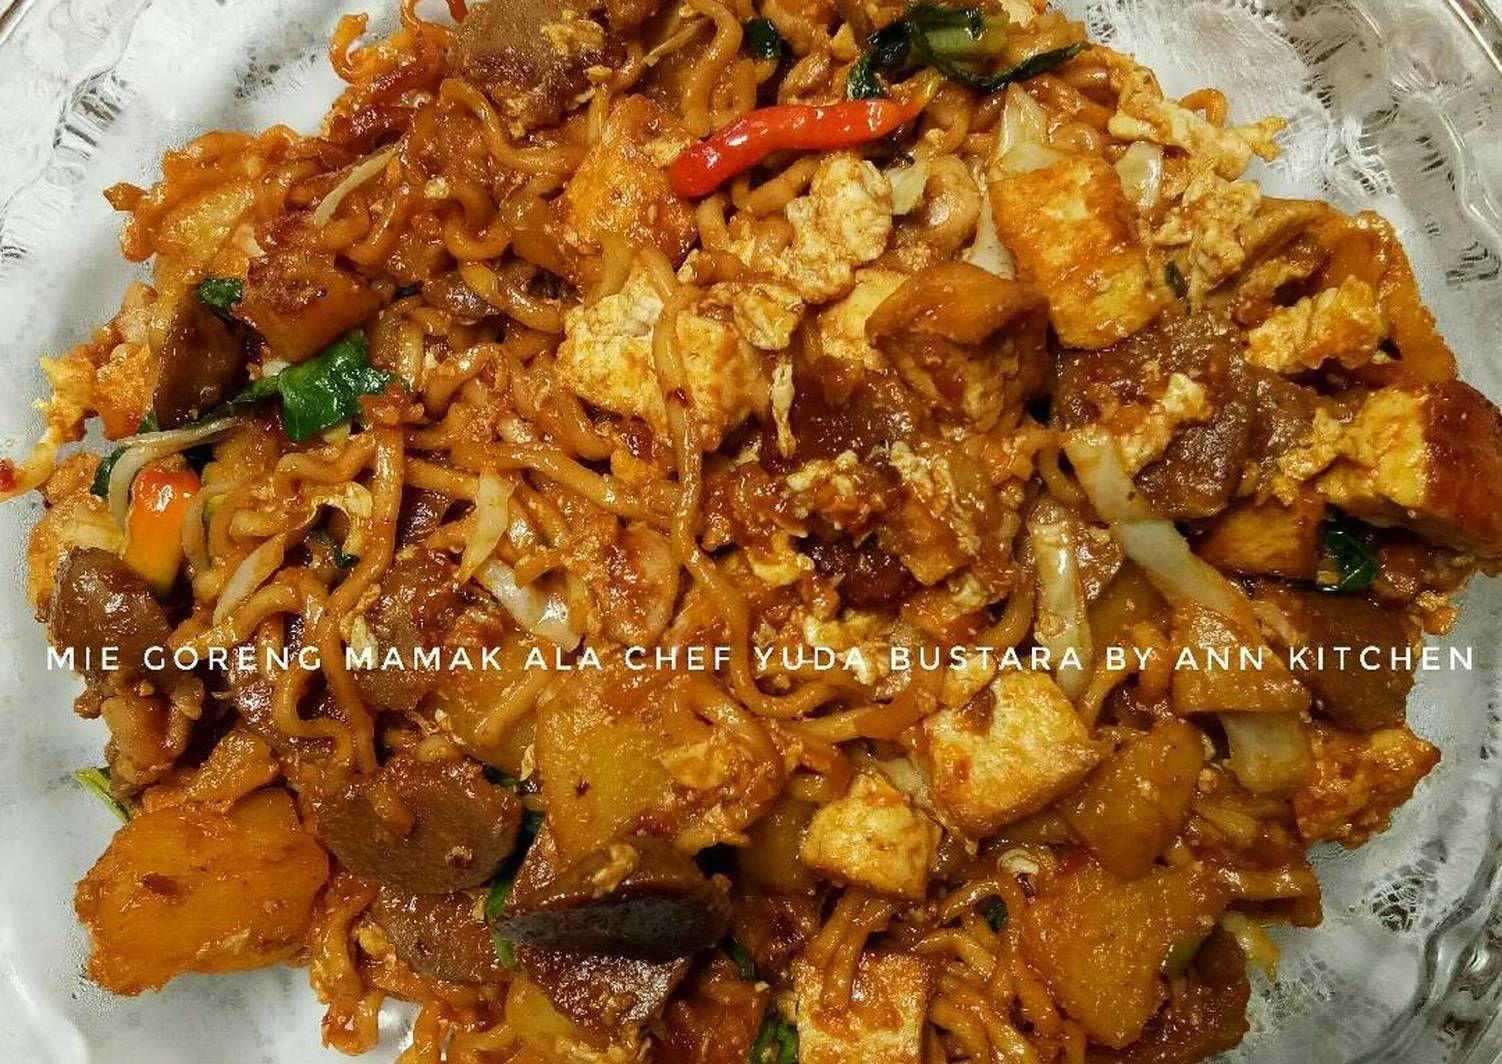 Resep Mie Goreng Mamak Ala Chef Yuda Bustara Oleh Falen Ann Resep Koki Makanan Masakan